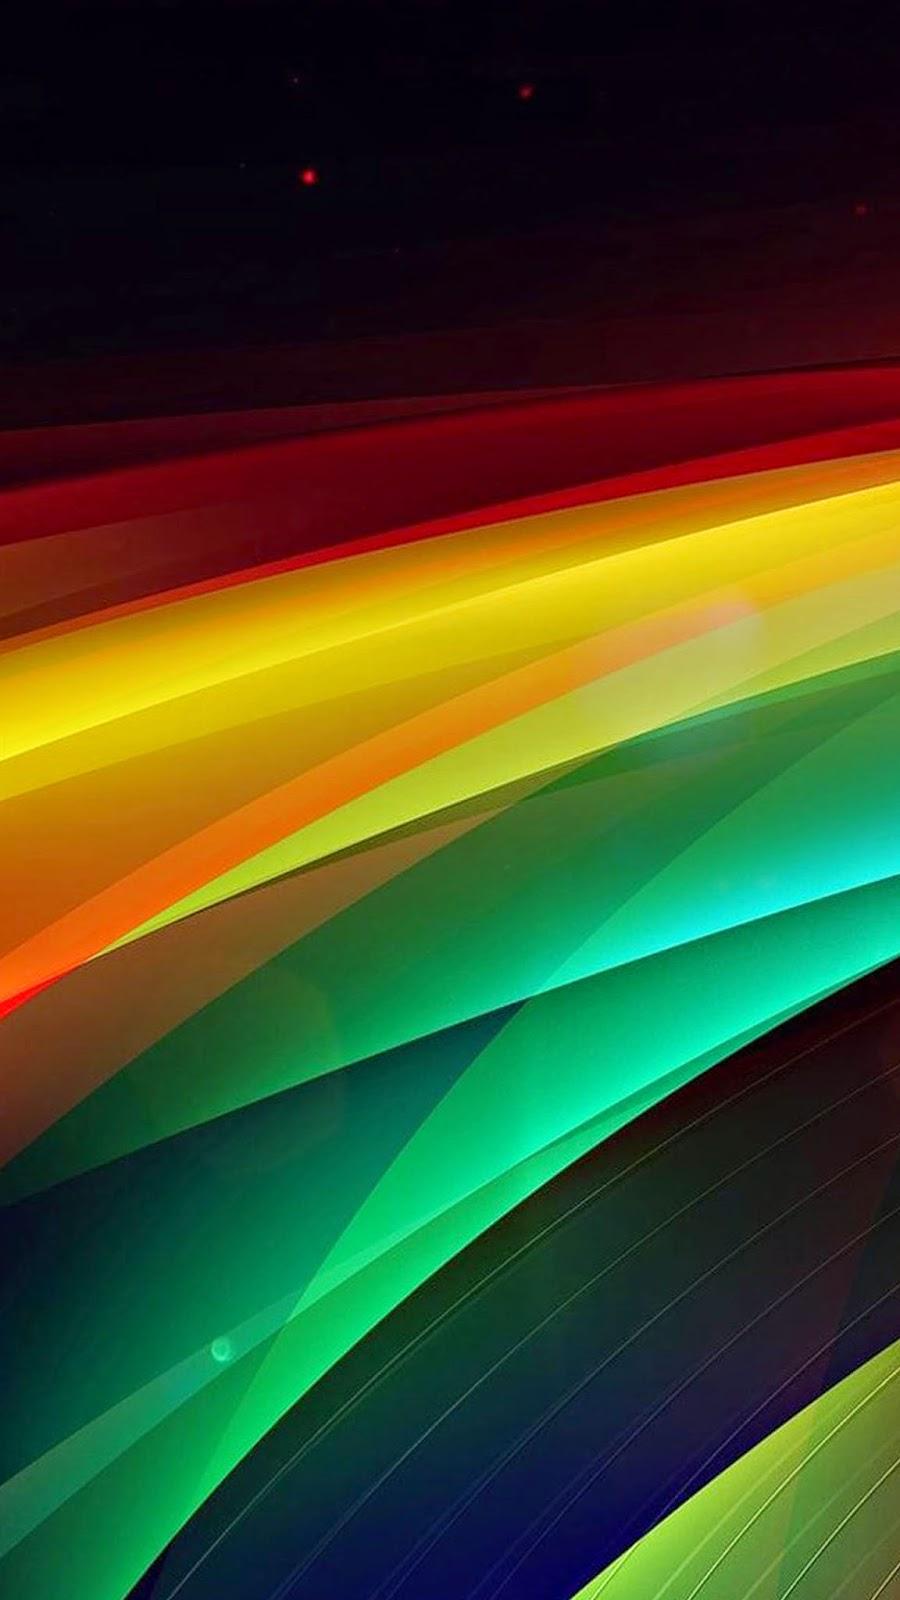 Samsung Galaxy S6 S6 Edge Hd Wallpapers Dezignhd Graphic Design 900x1600 Download Hd Wallpaper Wallpapertip